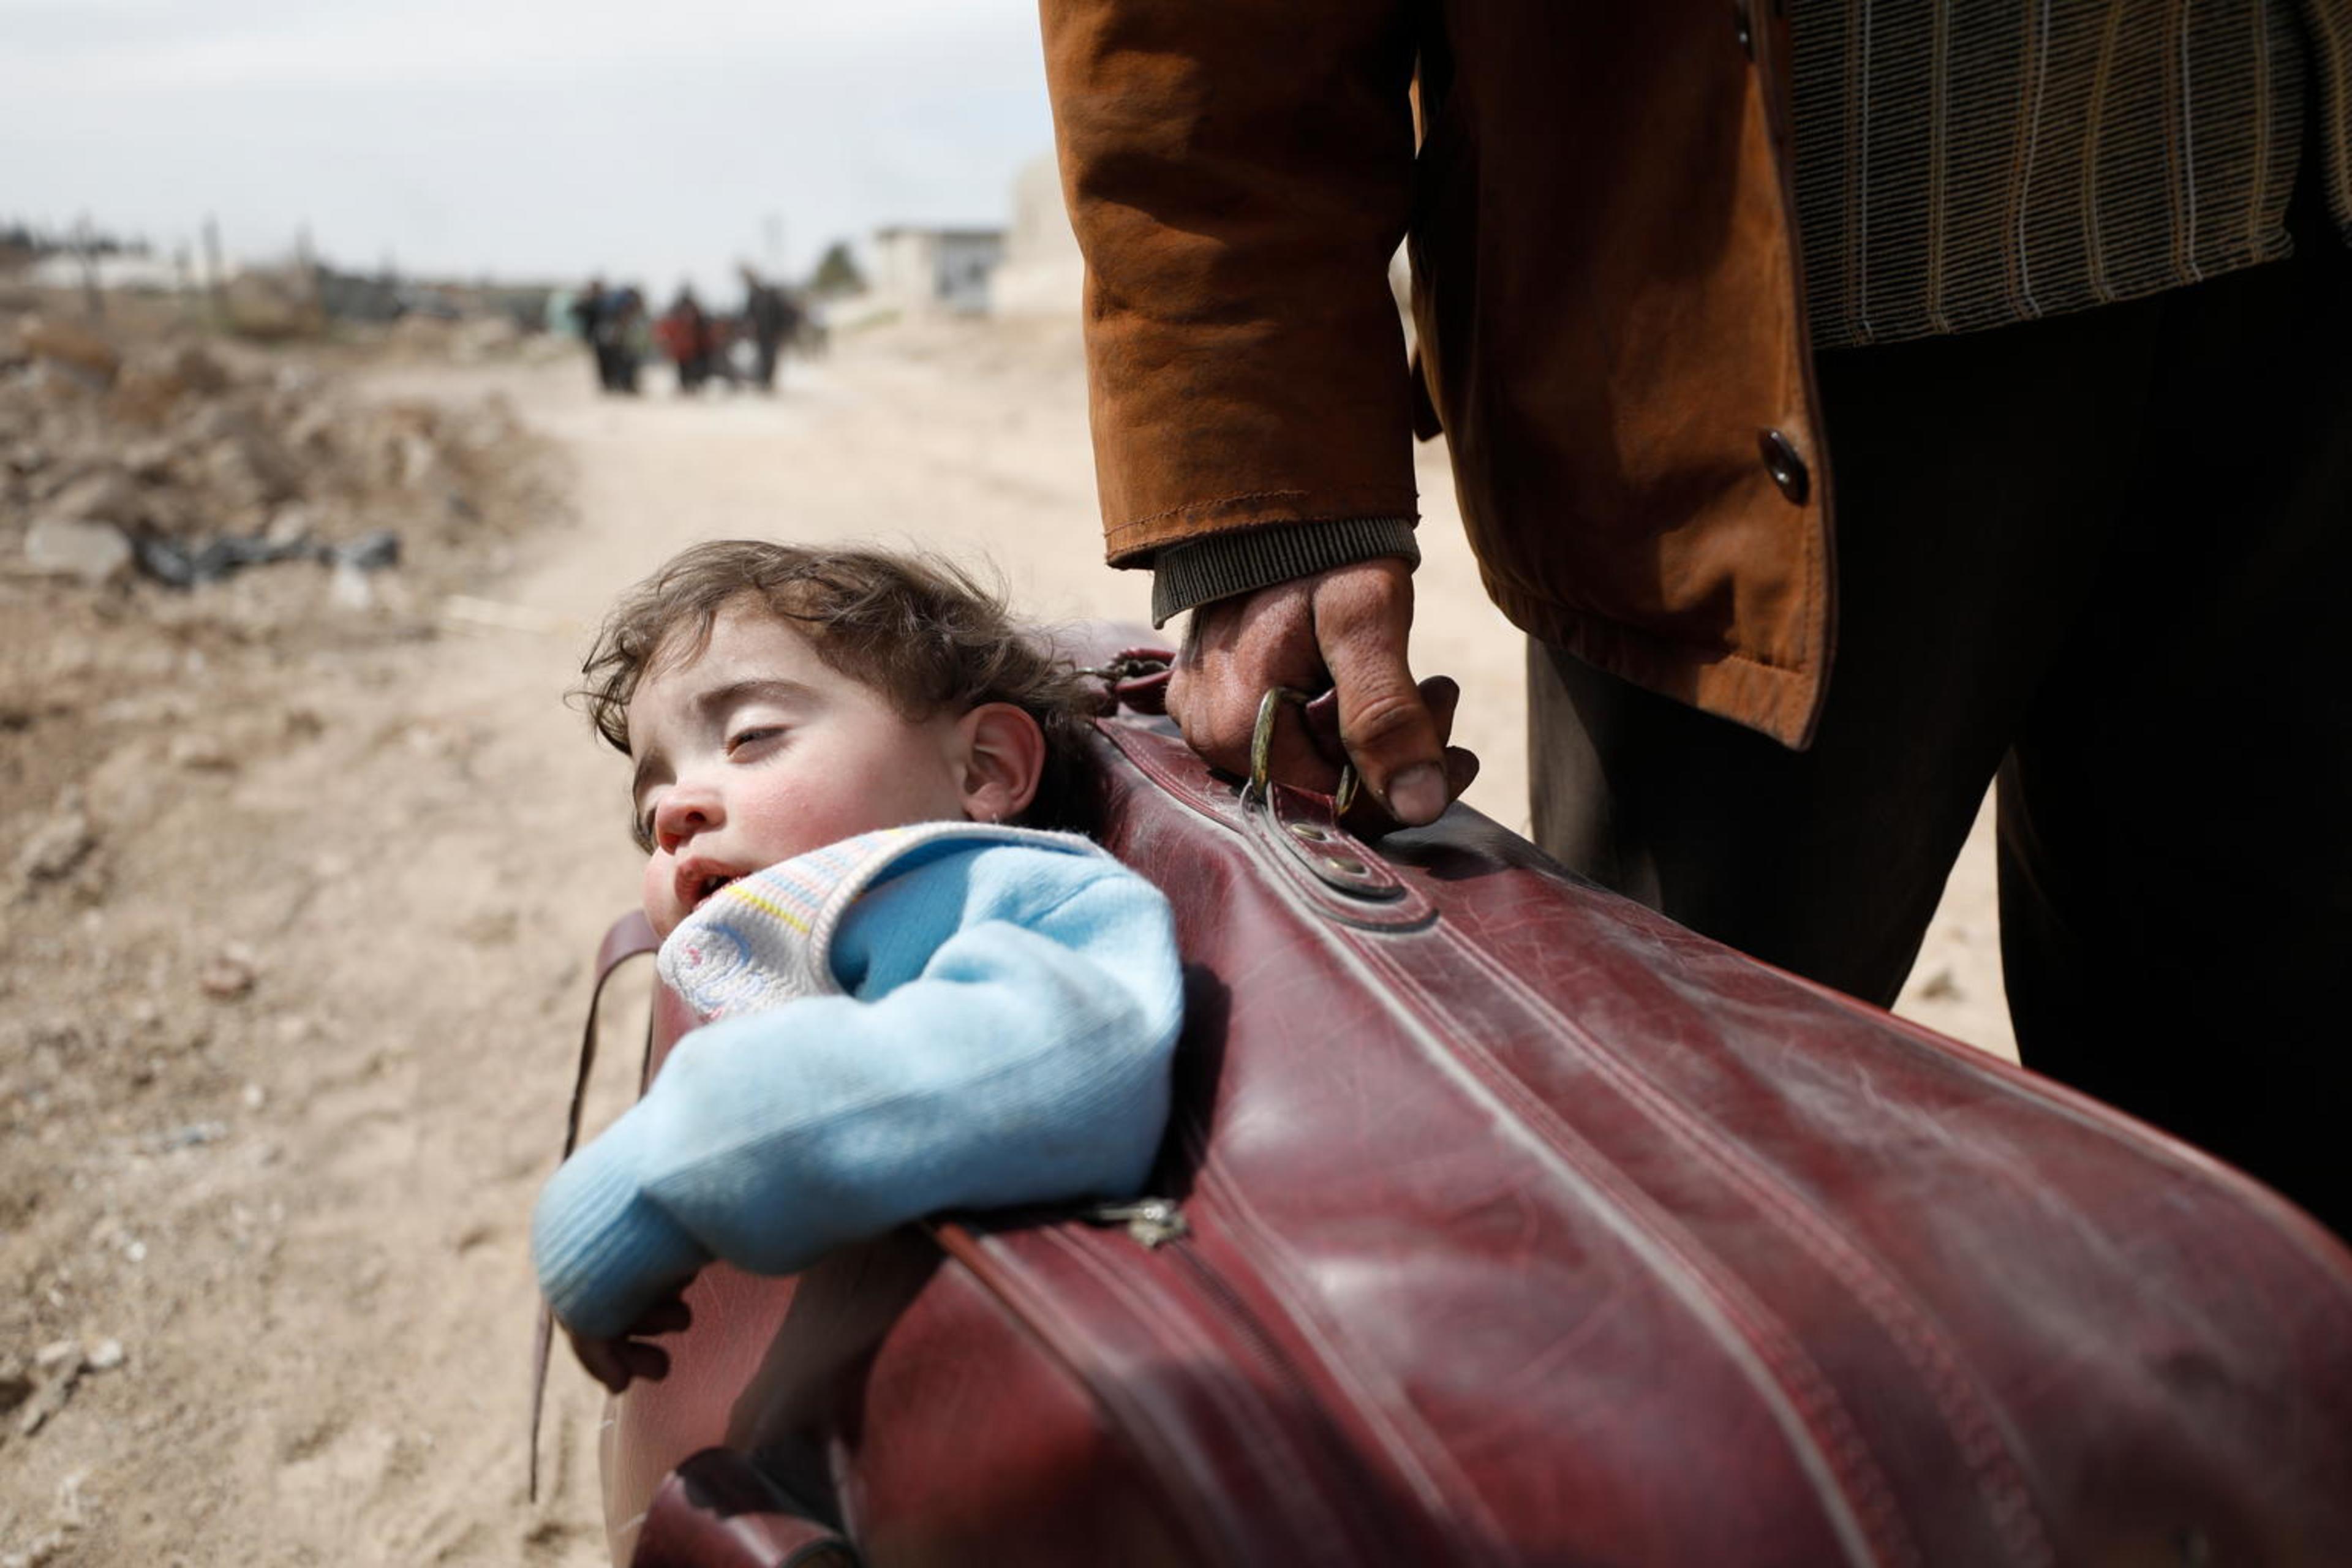 © UNICEF/UN0185401/Sanadiki